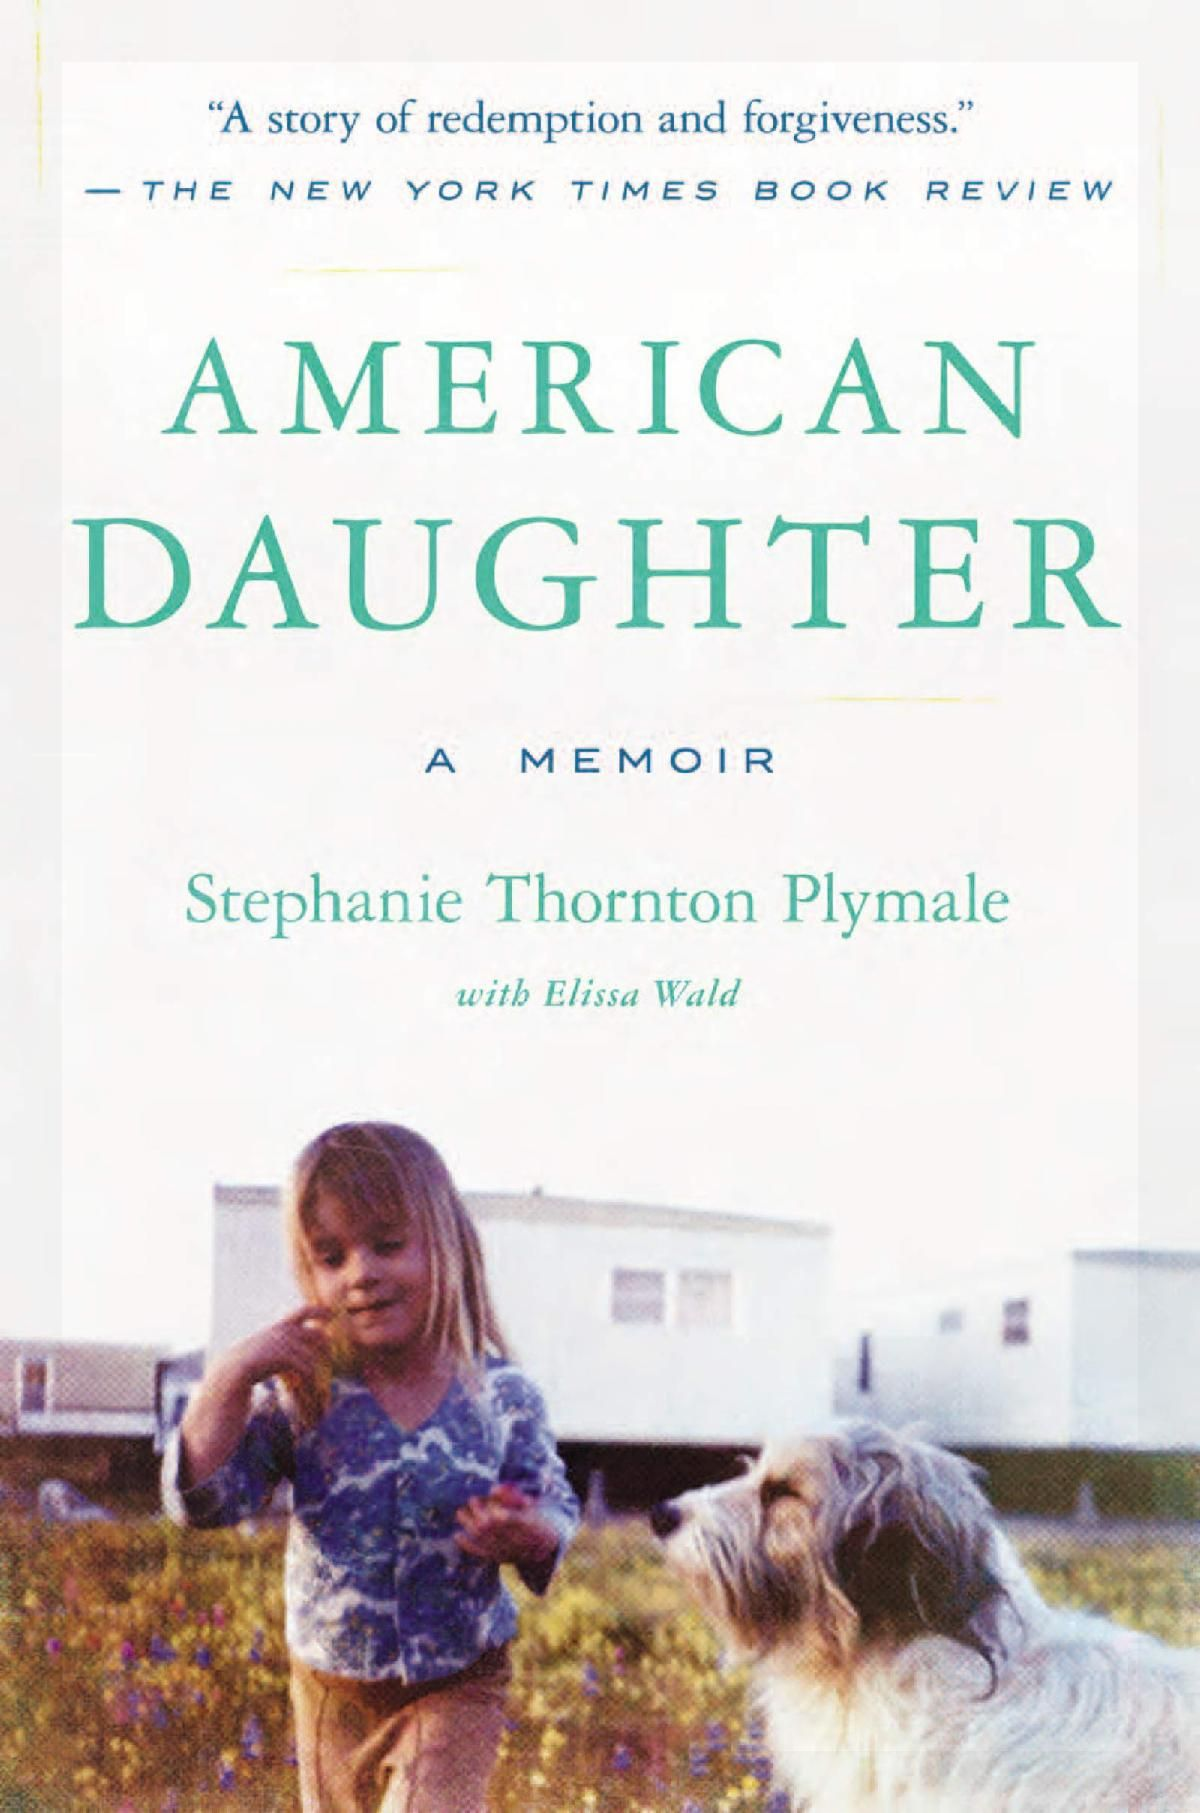 americandaughter